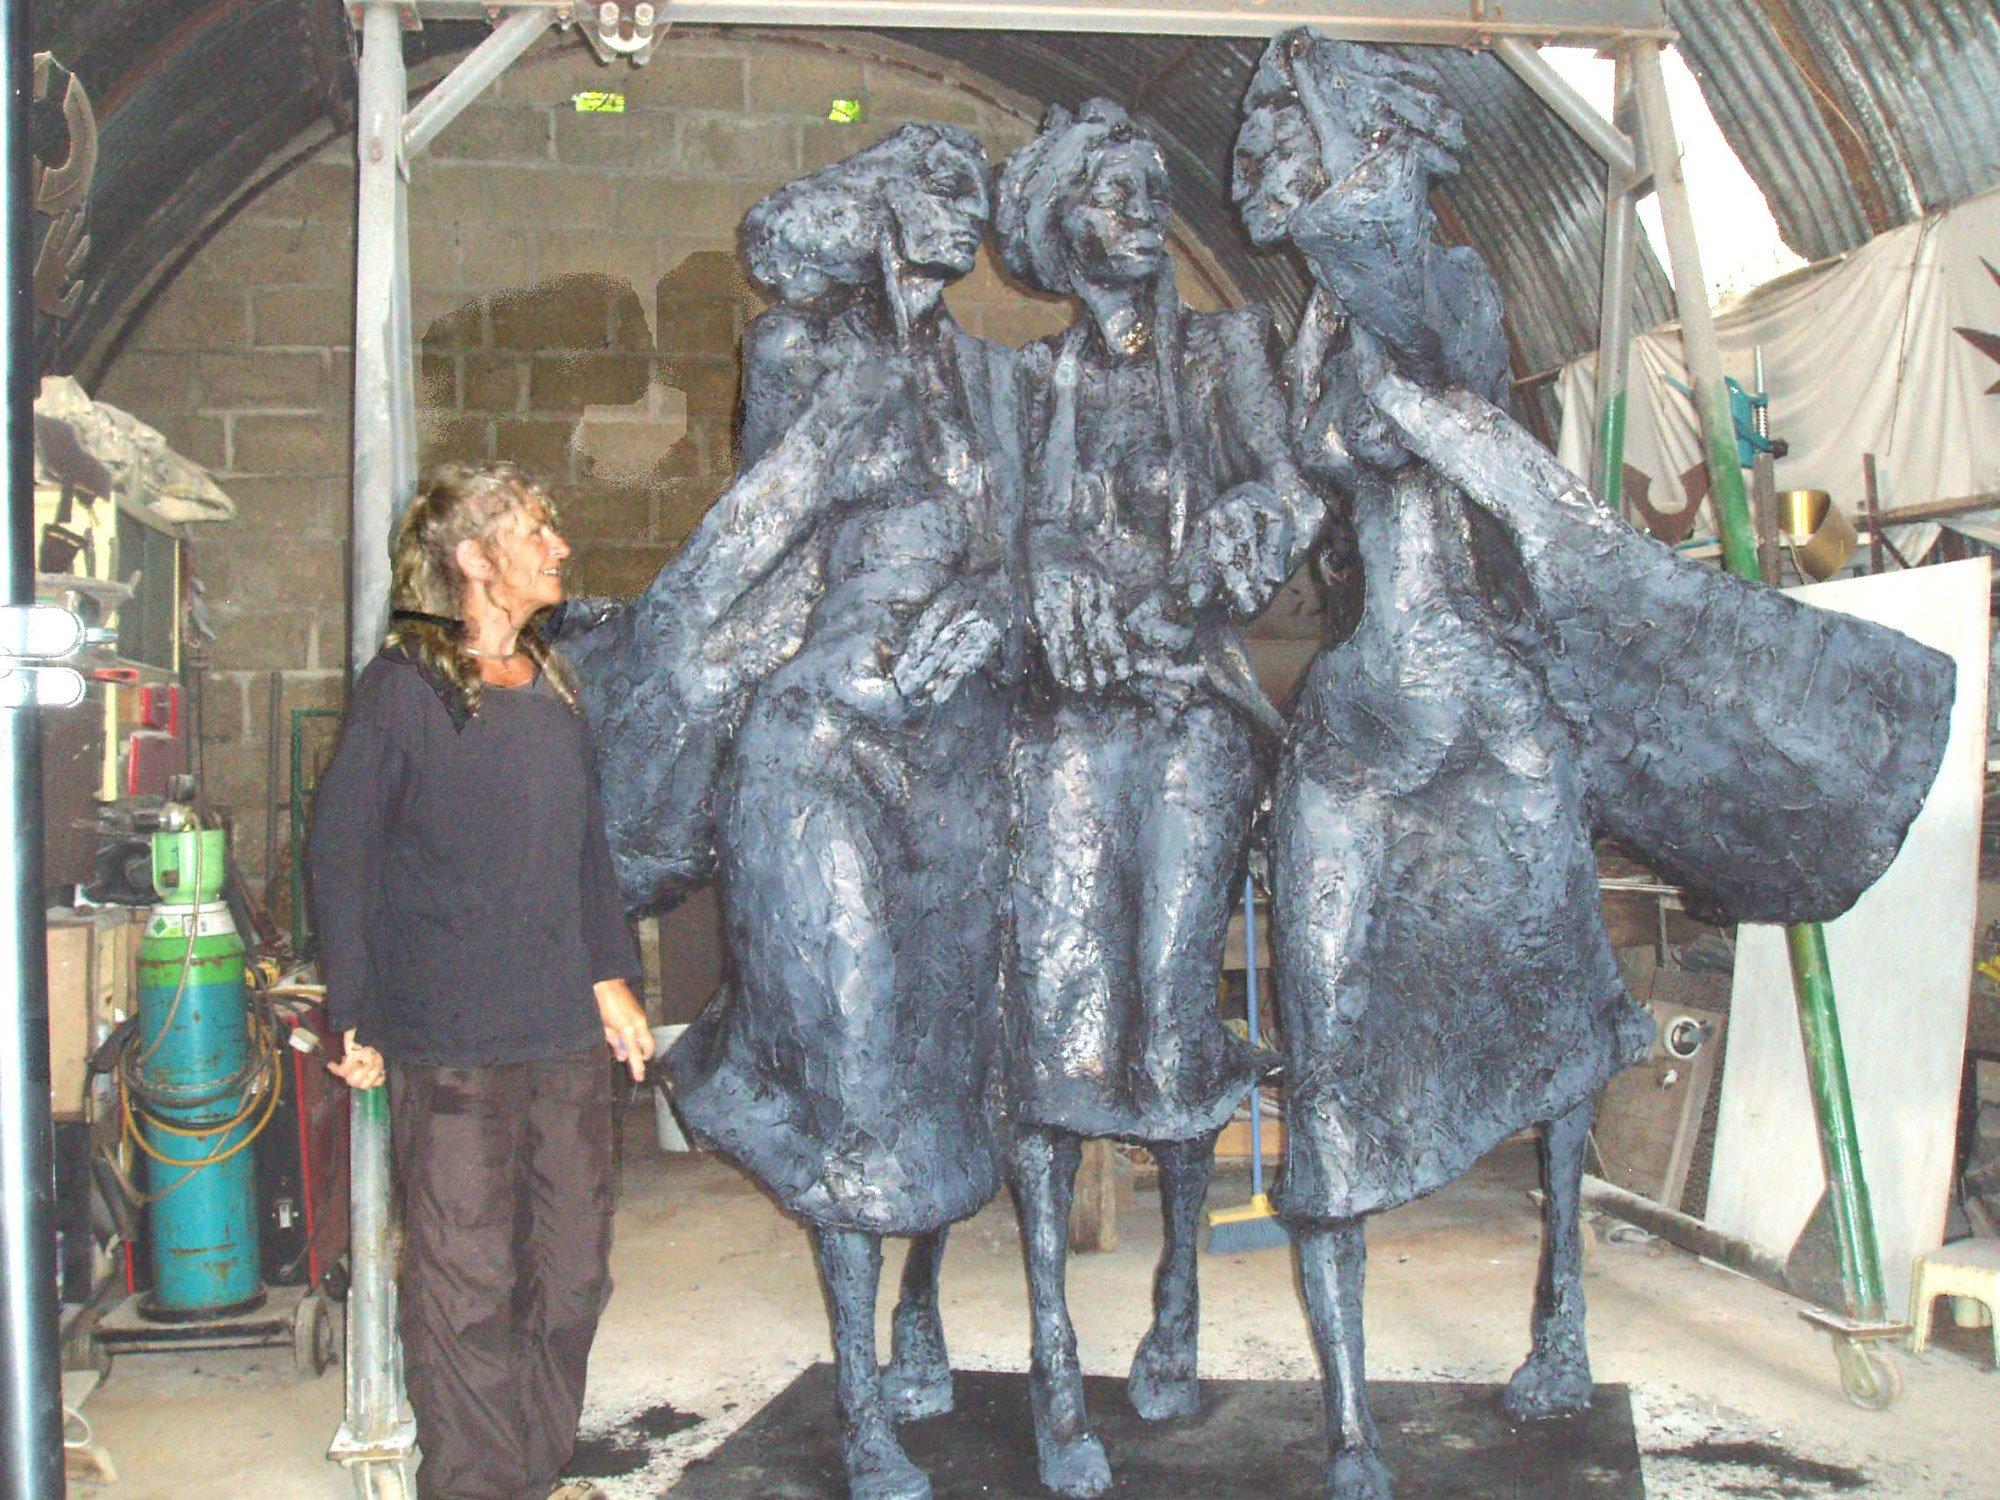 Factory Woman Sculpture by Greta Berlin